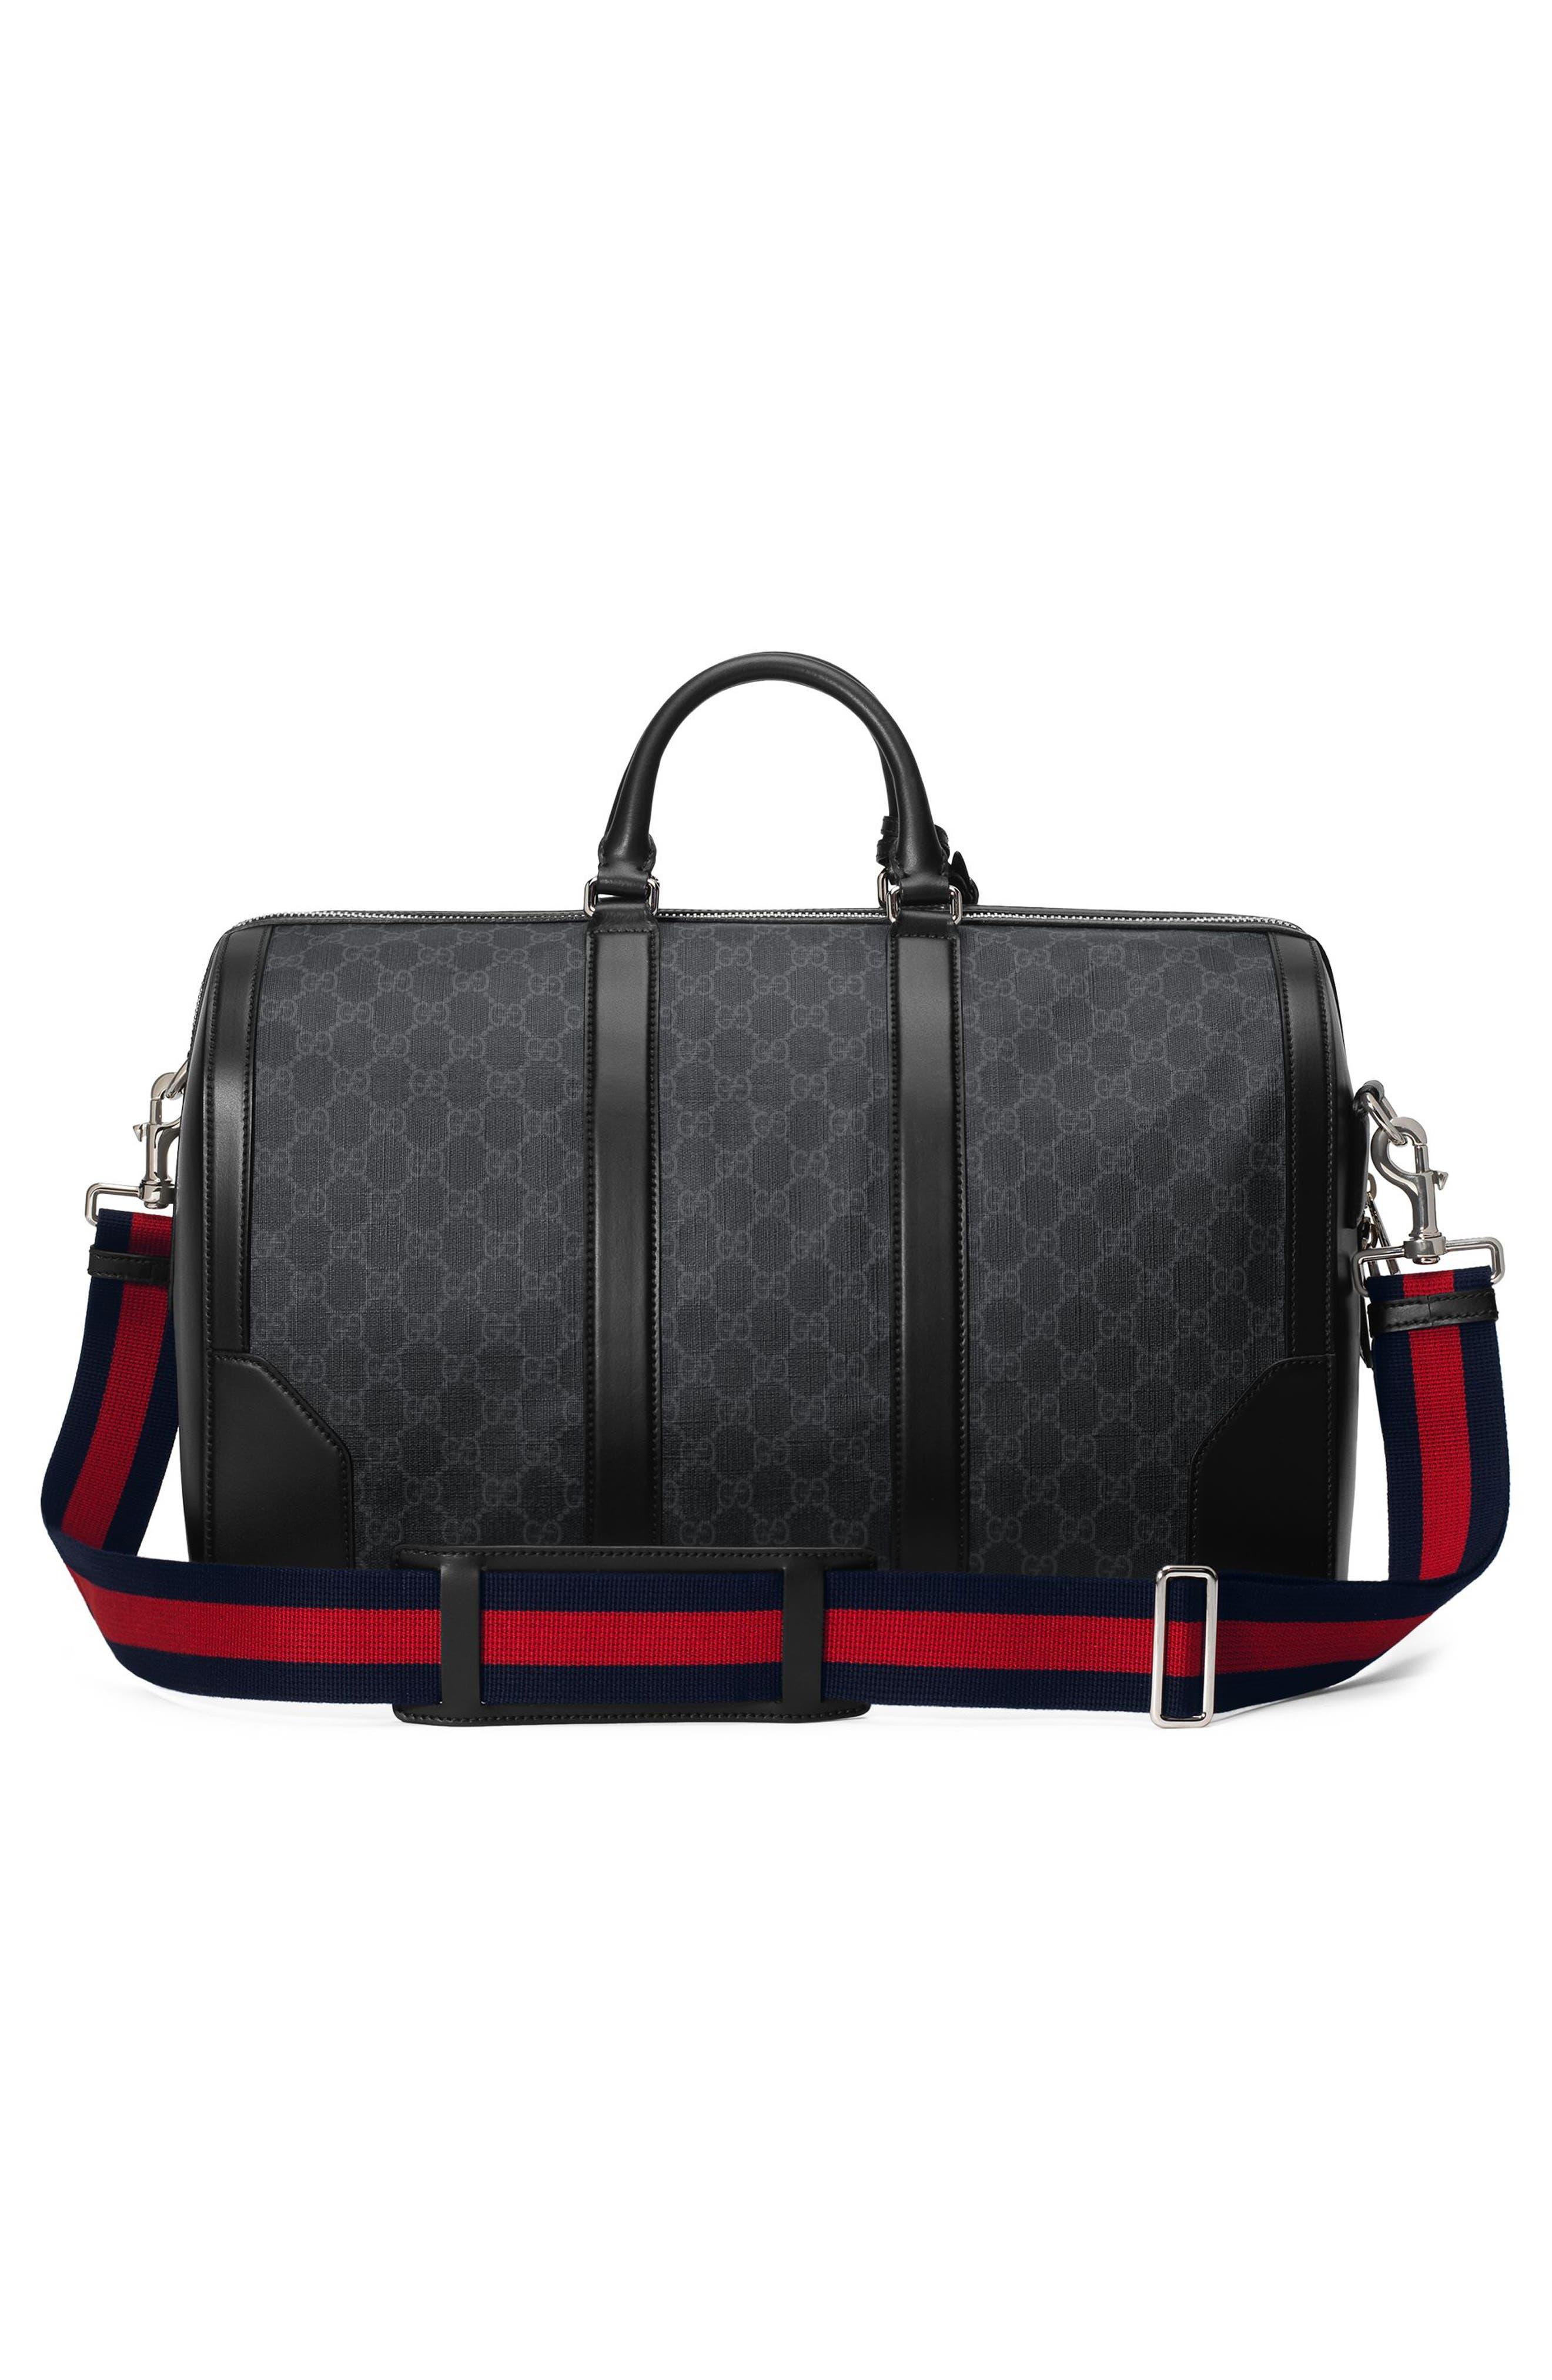 GG Supreme Duffel Bag,                             Alternate thumbnail 2, color,                             Black